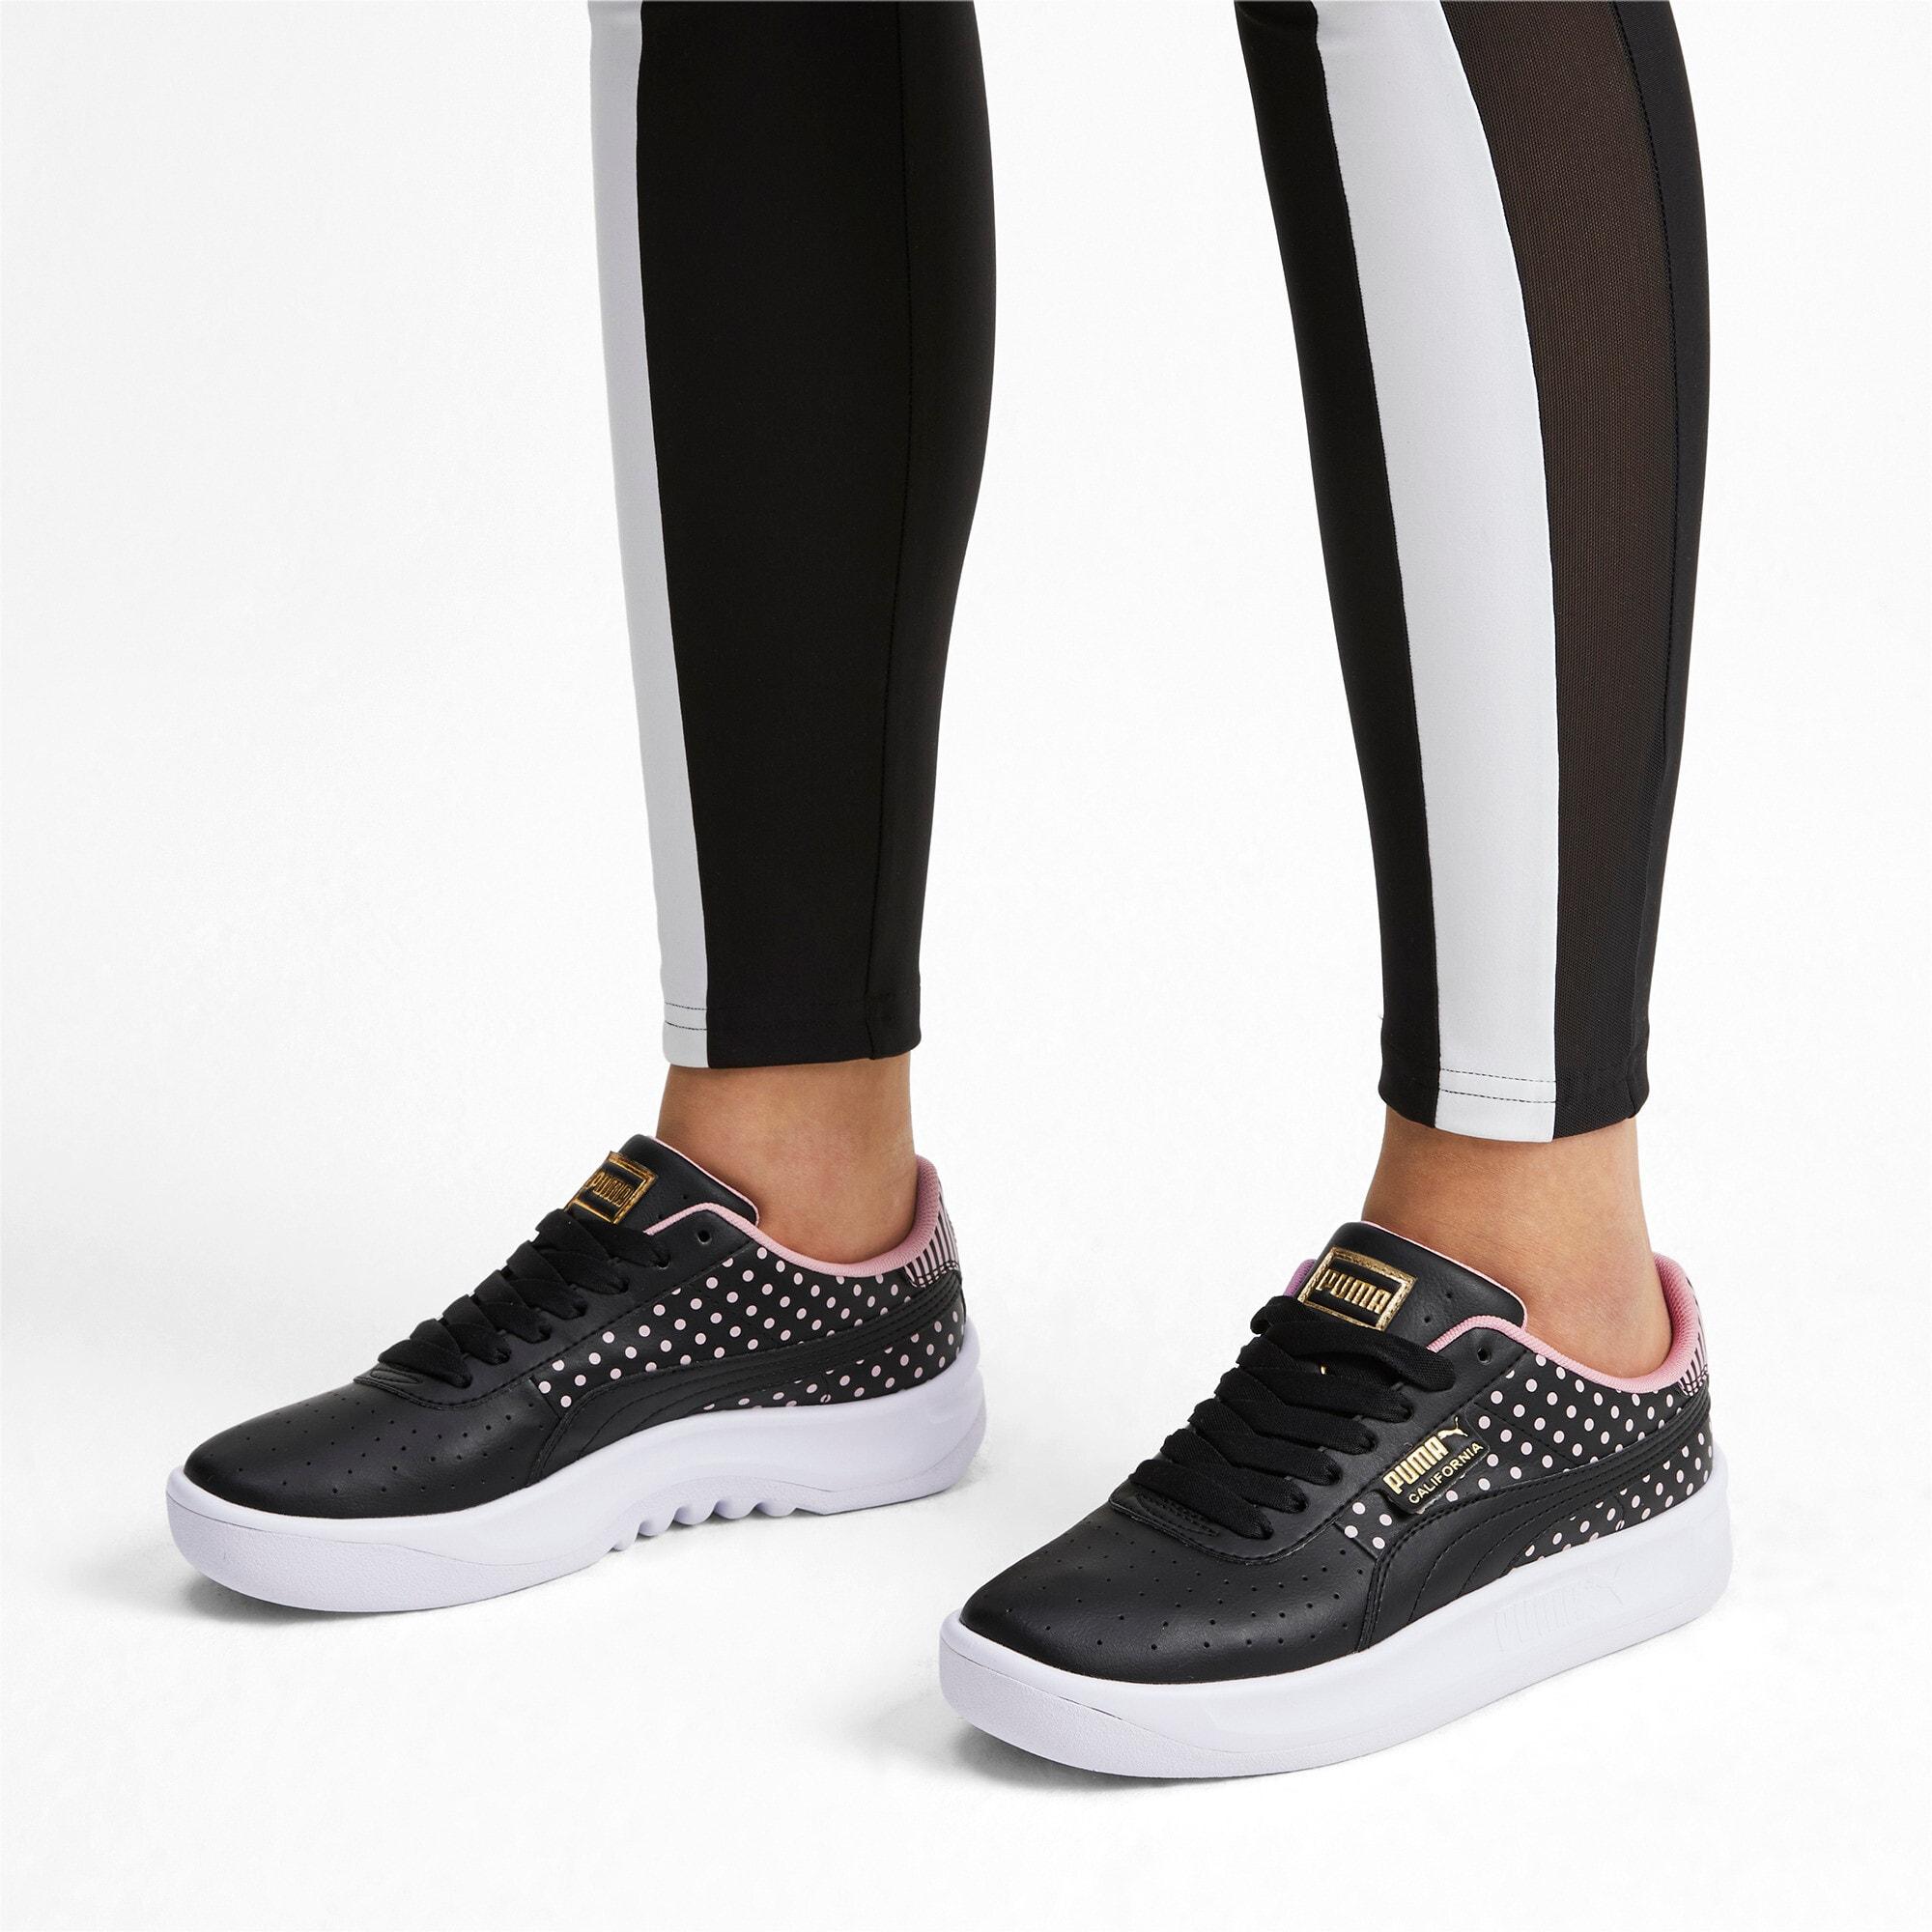 Thumbnail 3 of California Remix Women's Sneakers, Puma Black-Bridal Rose, medium